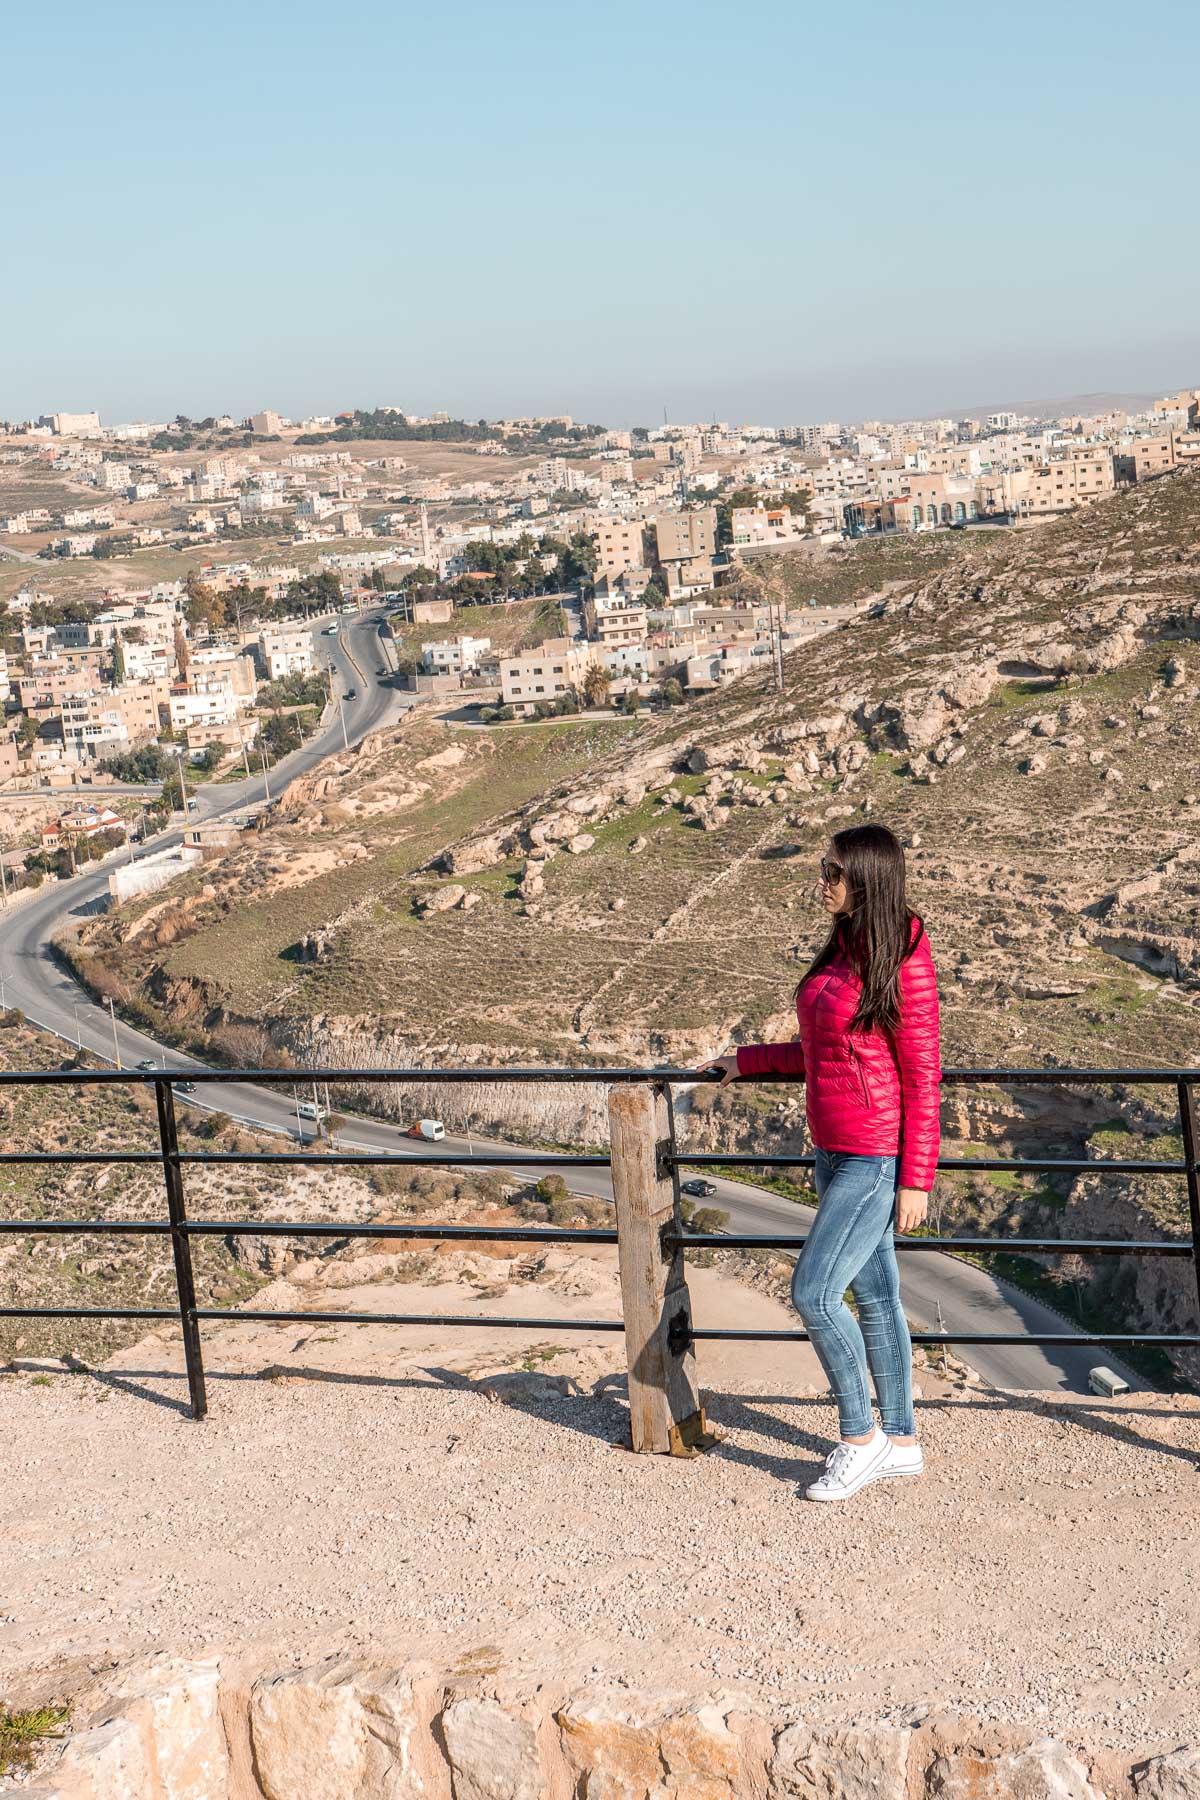 Girl in a pink jacket standing at the Kerak Castle in Jordan